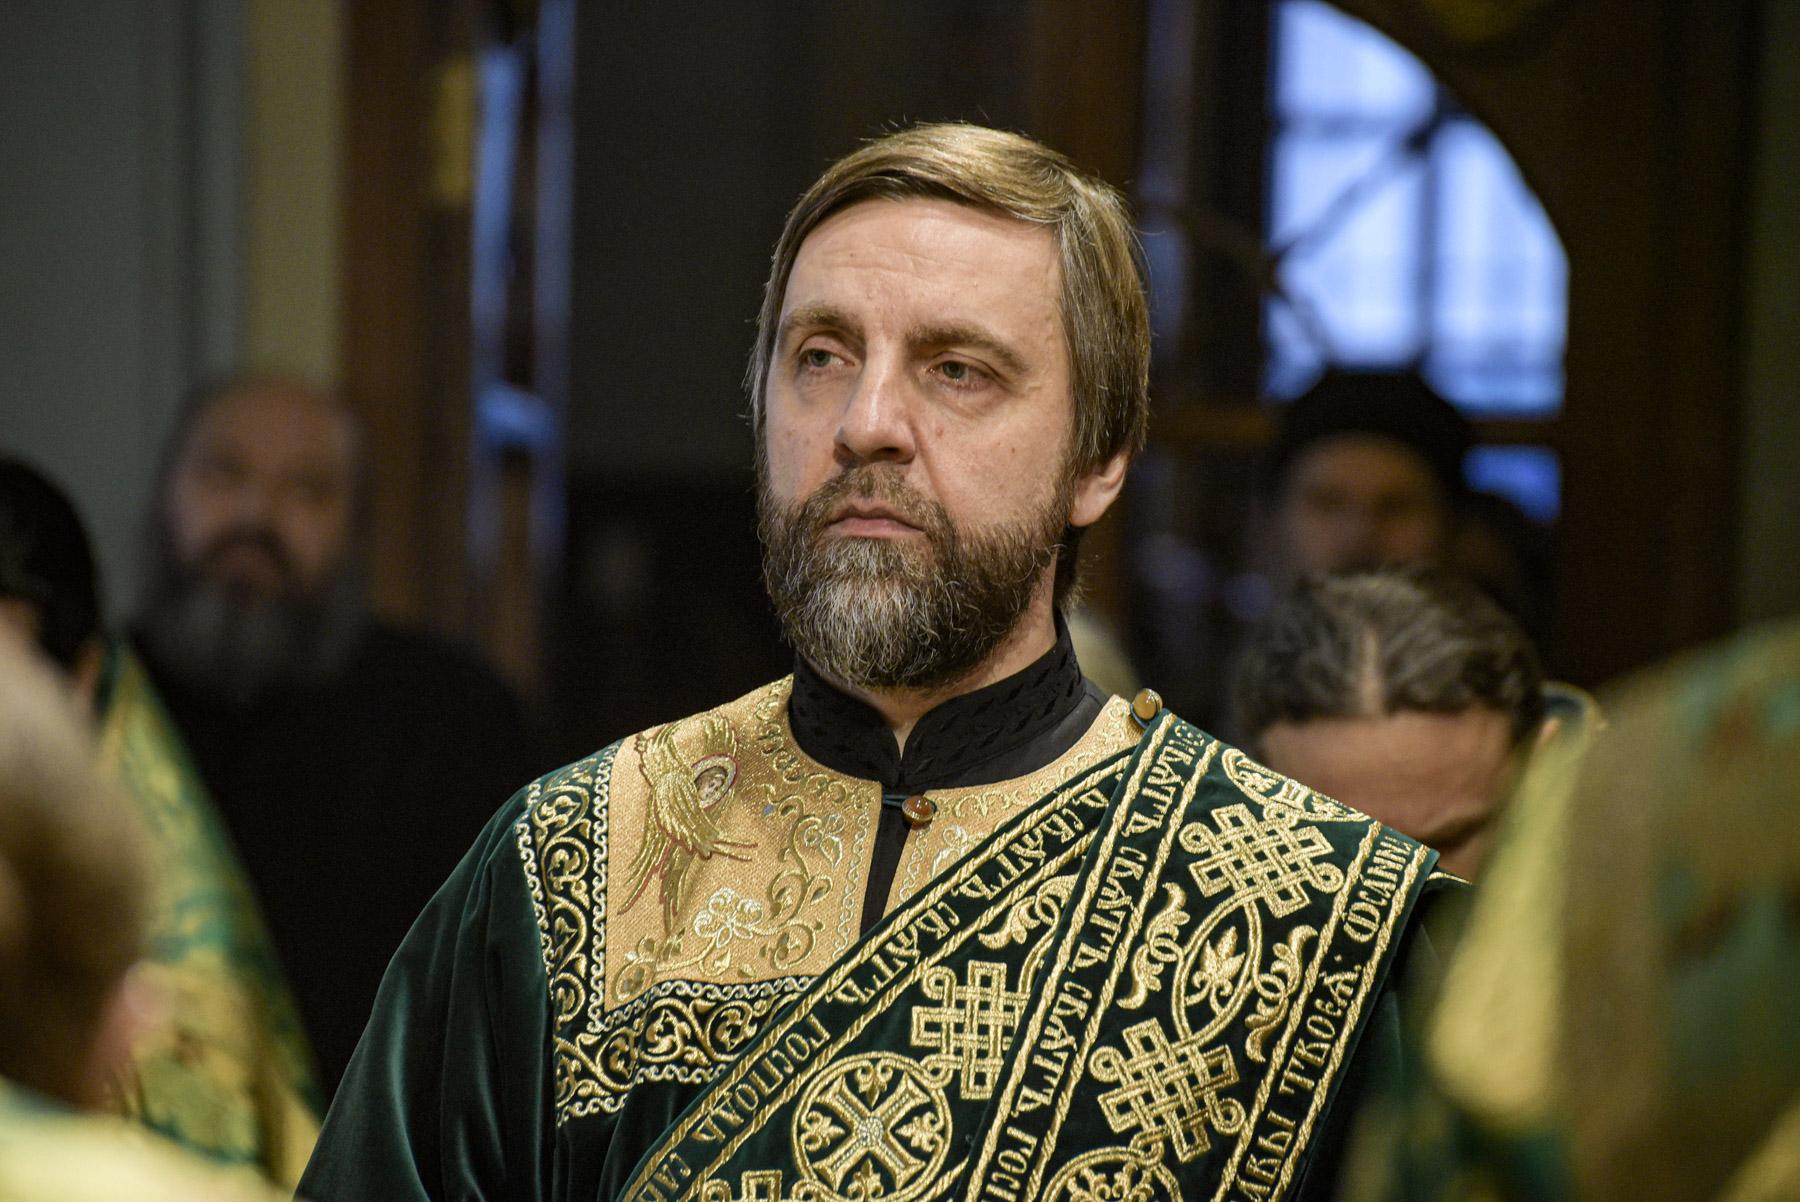 photos of orthodox christmas 0191 2